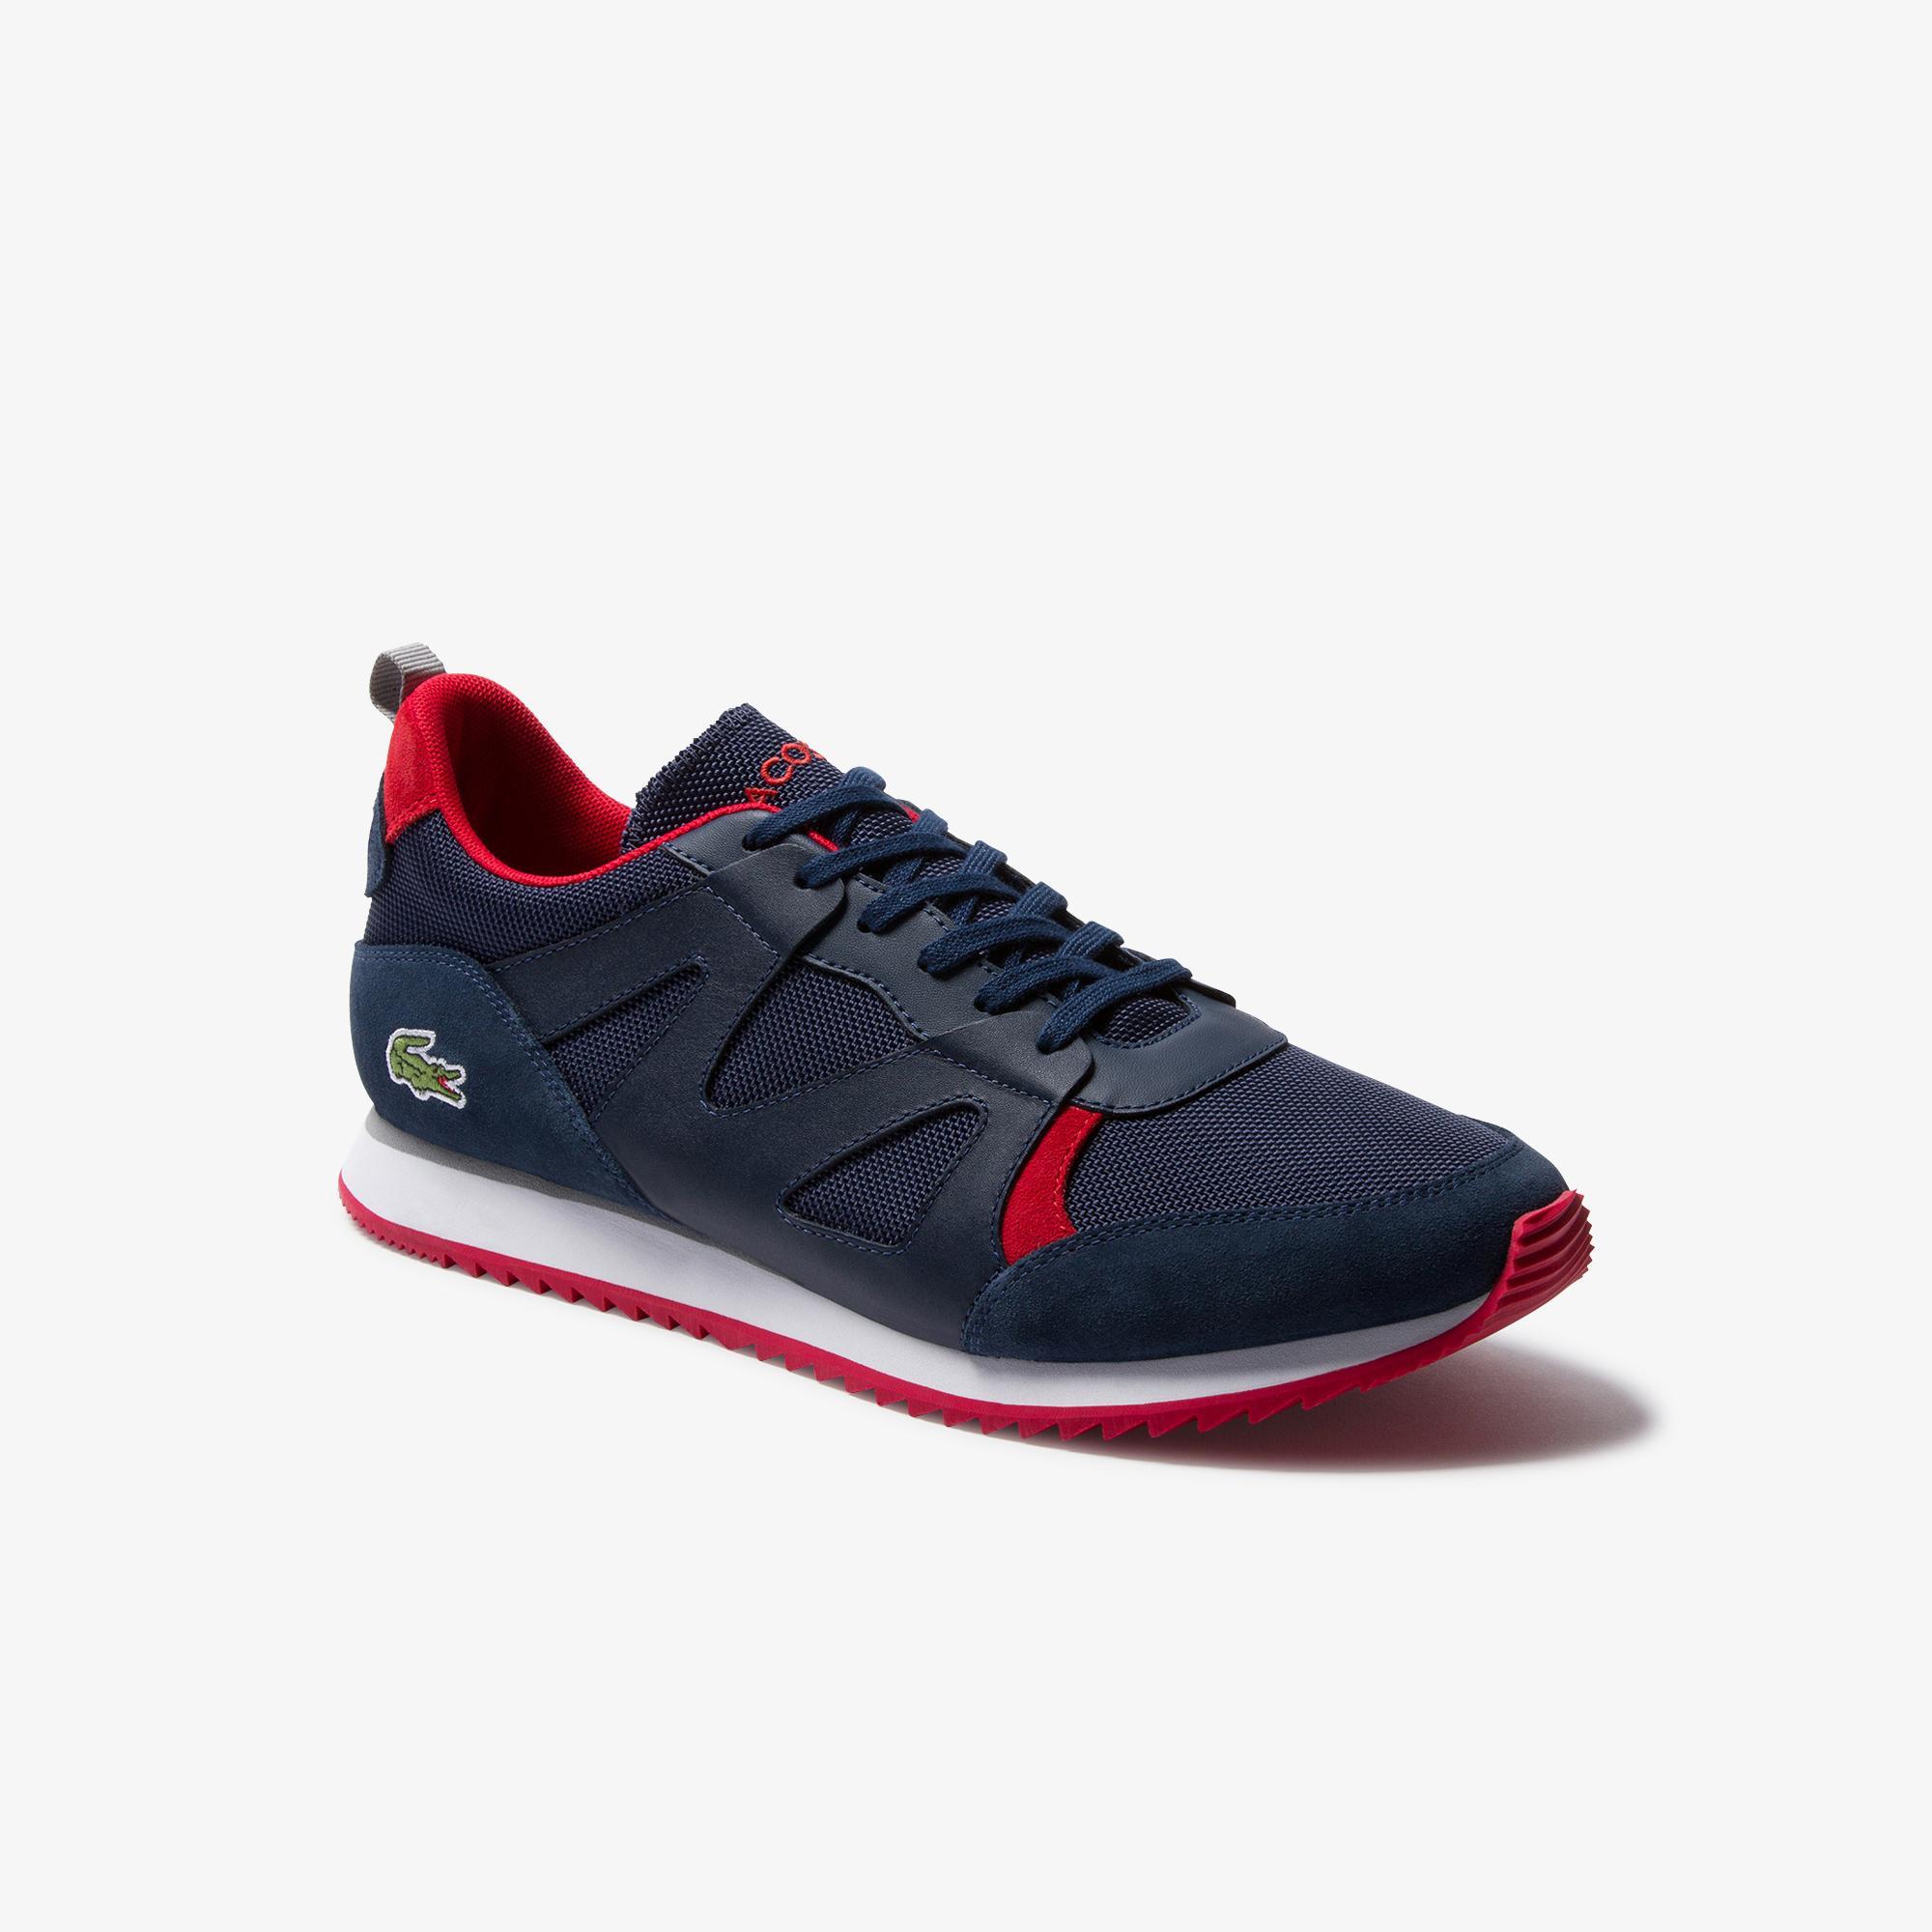 Lacoste Aesthet 120 2 Men's Sneakers